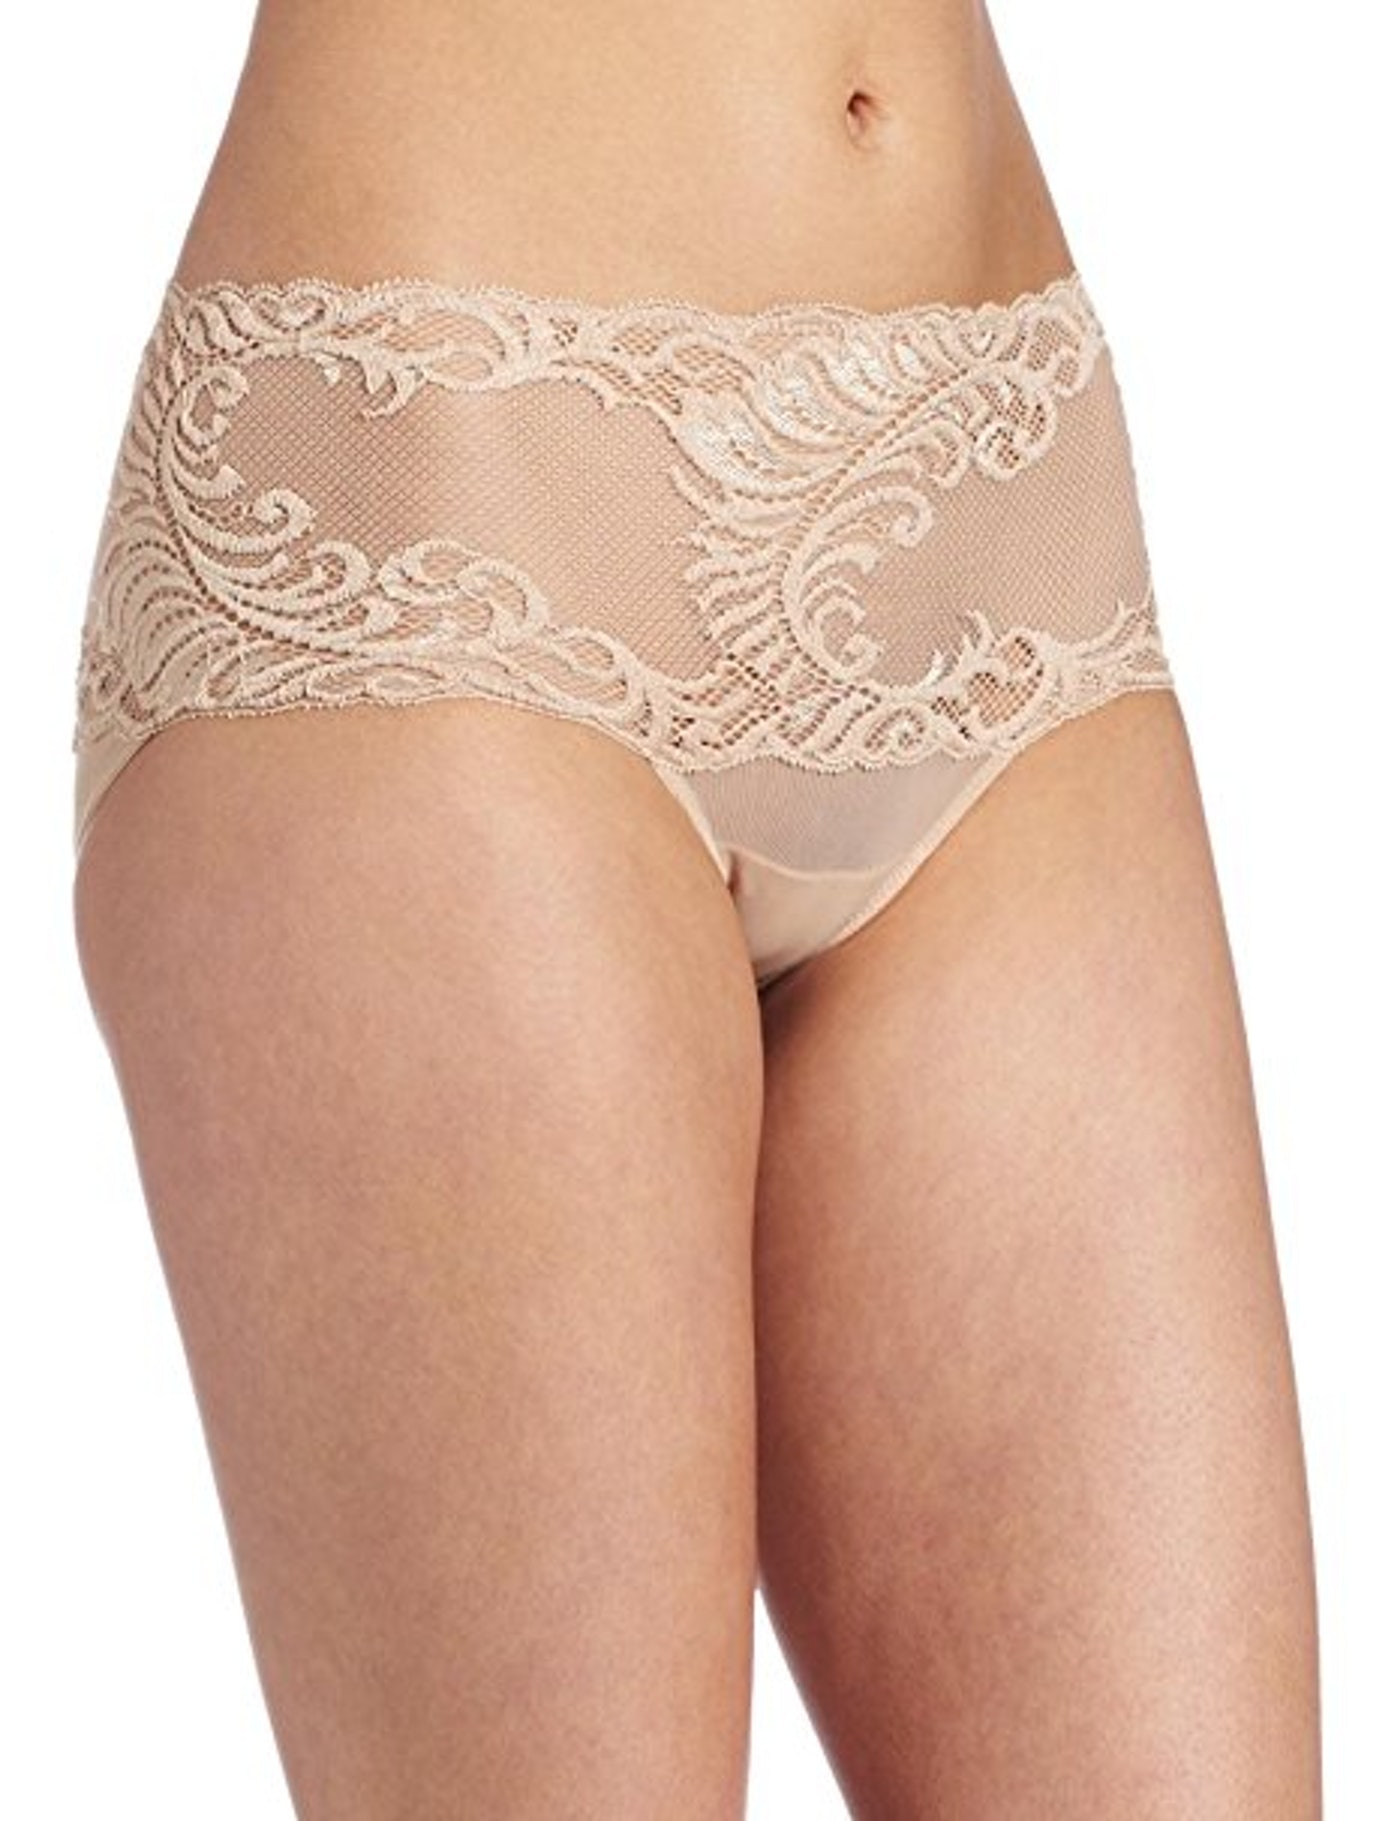 1950eede70c8 22 Weird But Genius Bras & Underwear You Won't Believe People Are Buying On  Amazon